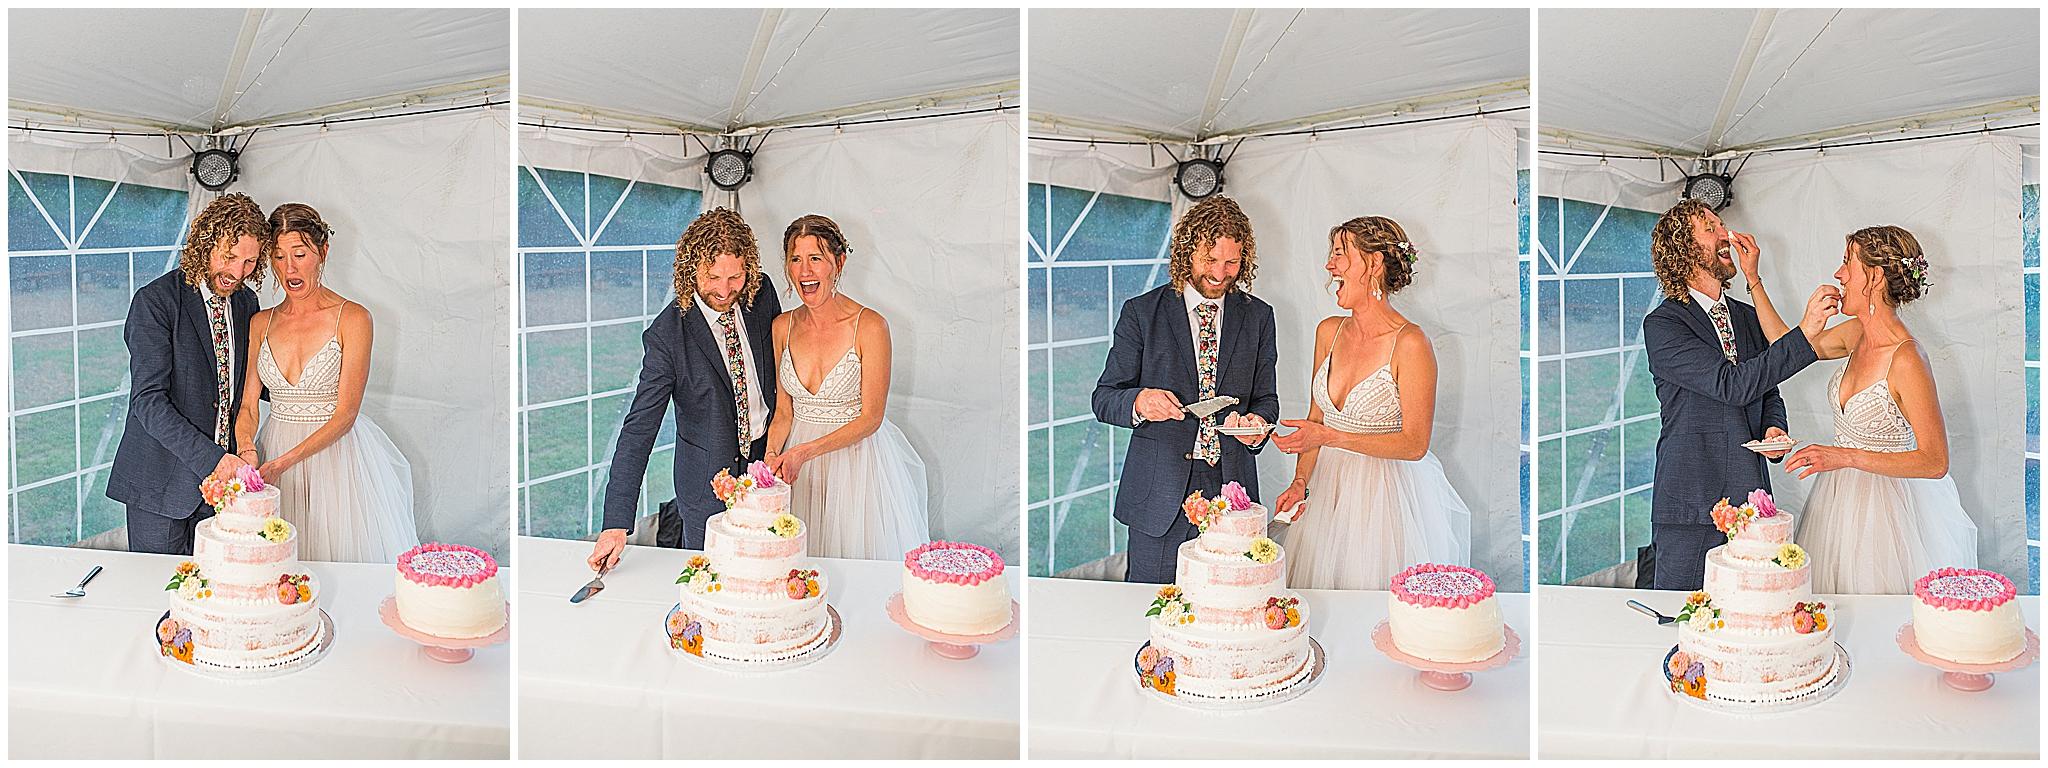 Asheville_Wedding_Photographers_Junebug_21.jpg